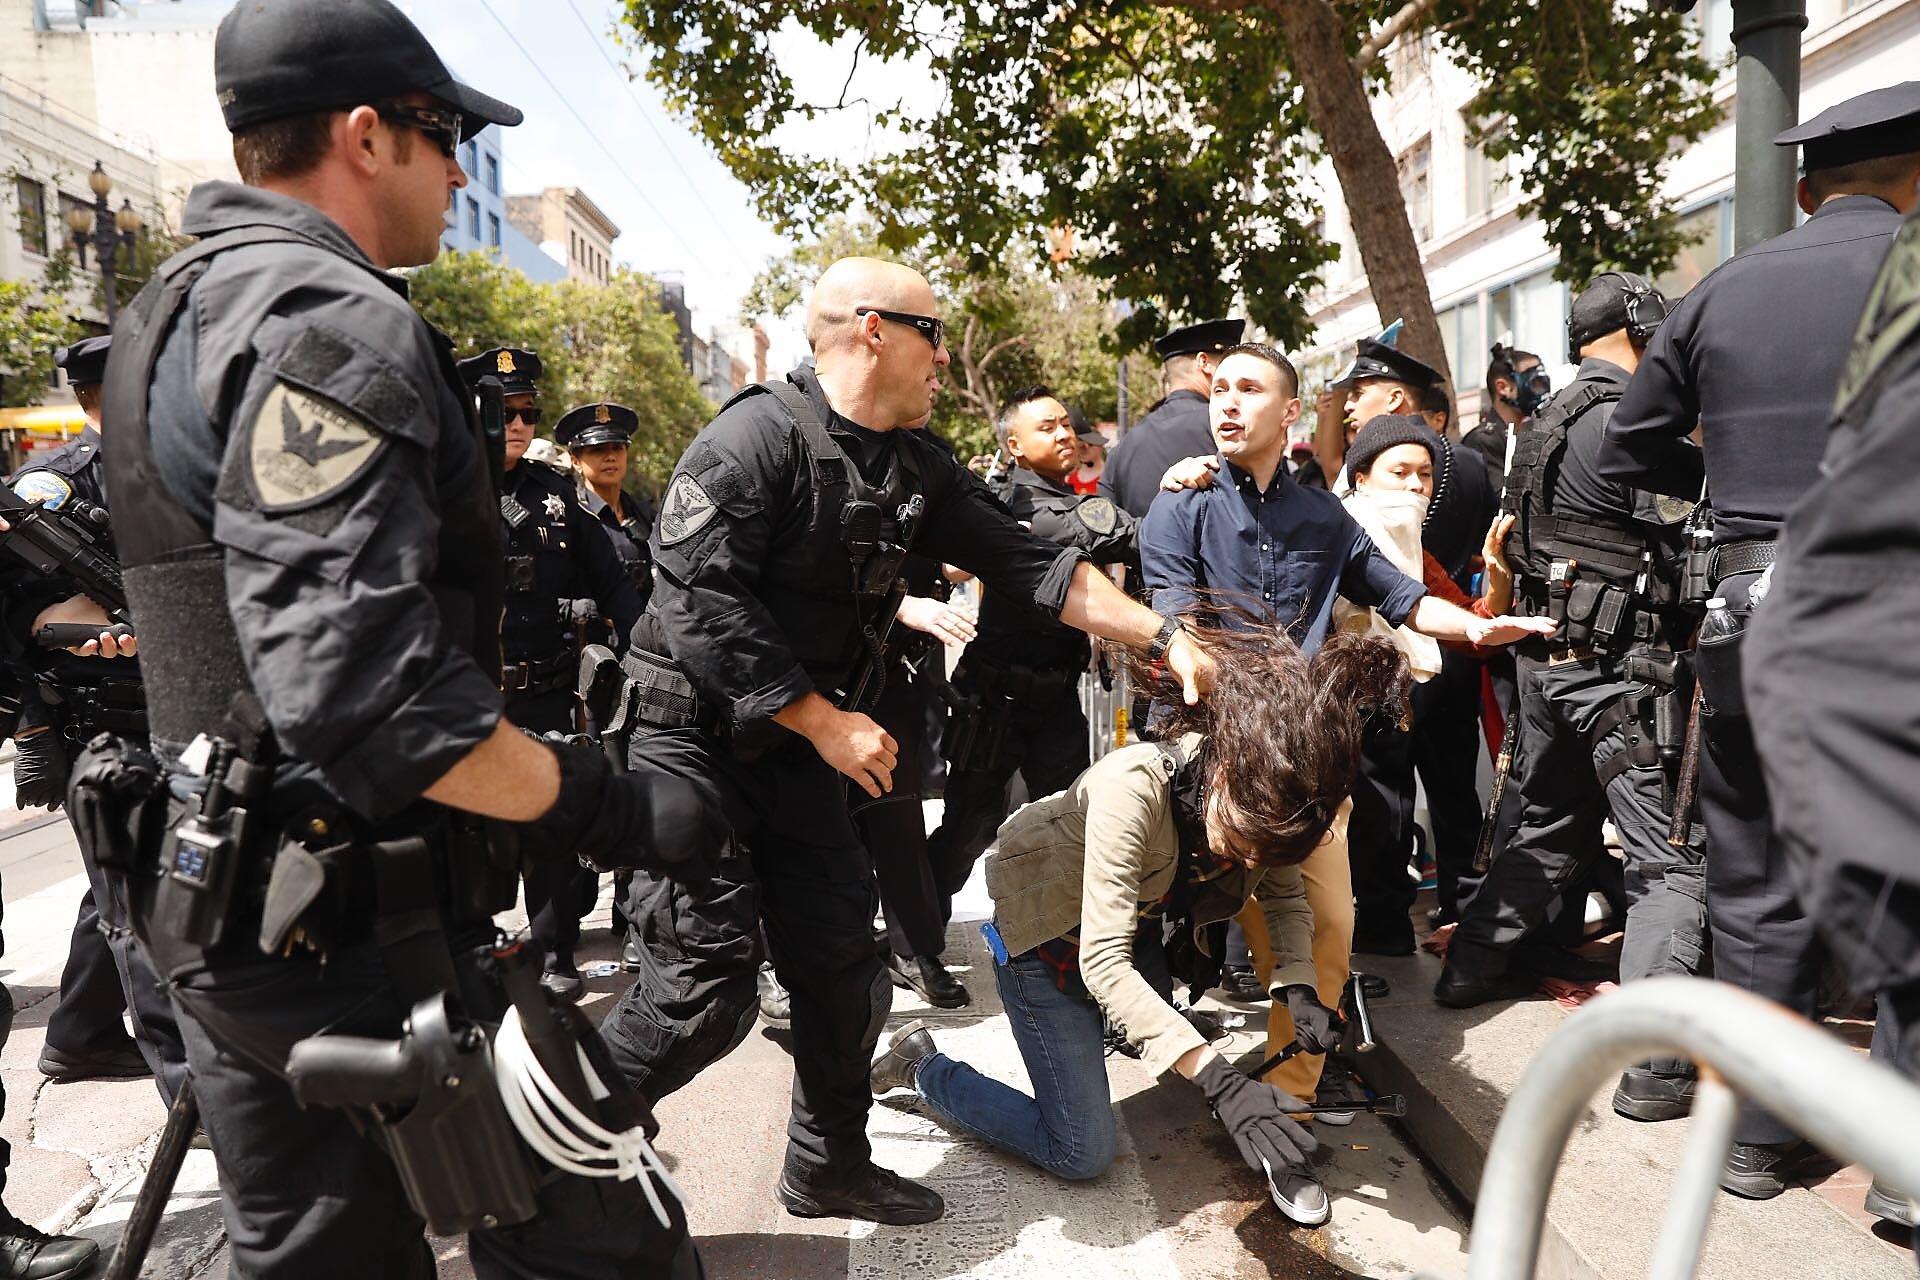 Anti-police demonstrators lying in street shut down Gay Pride Parade